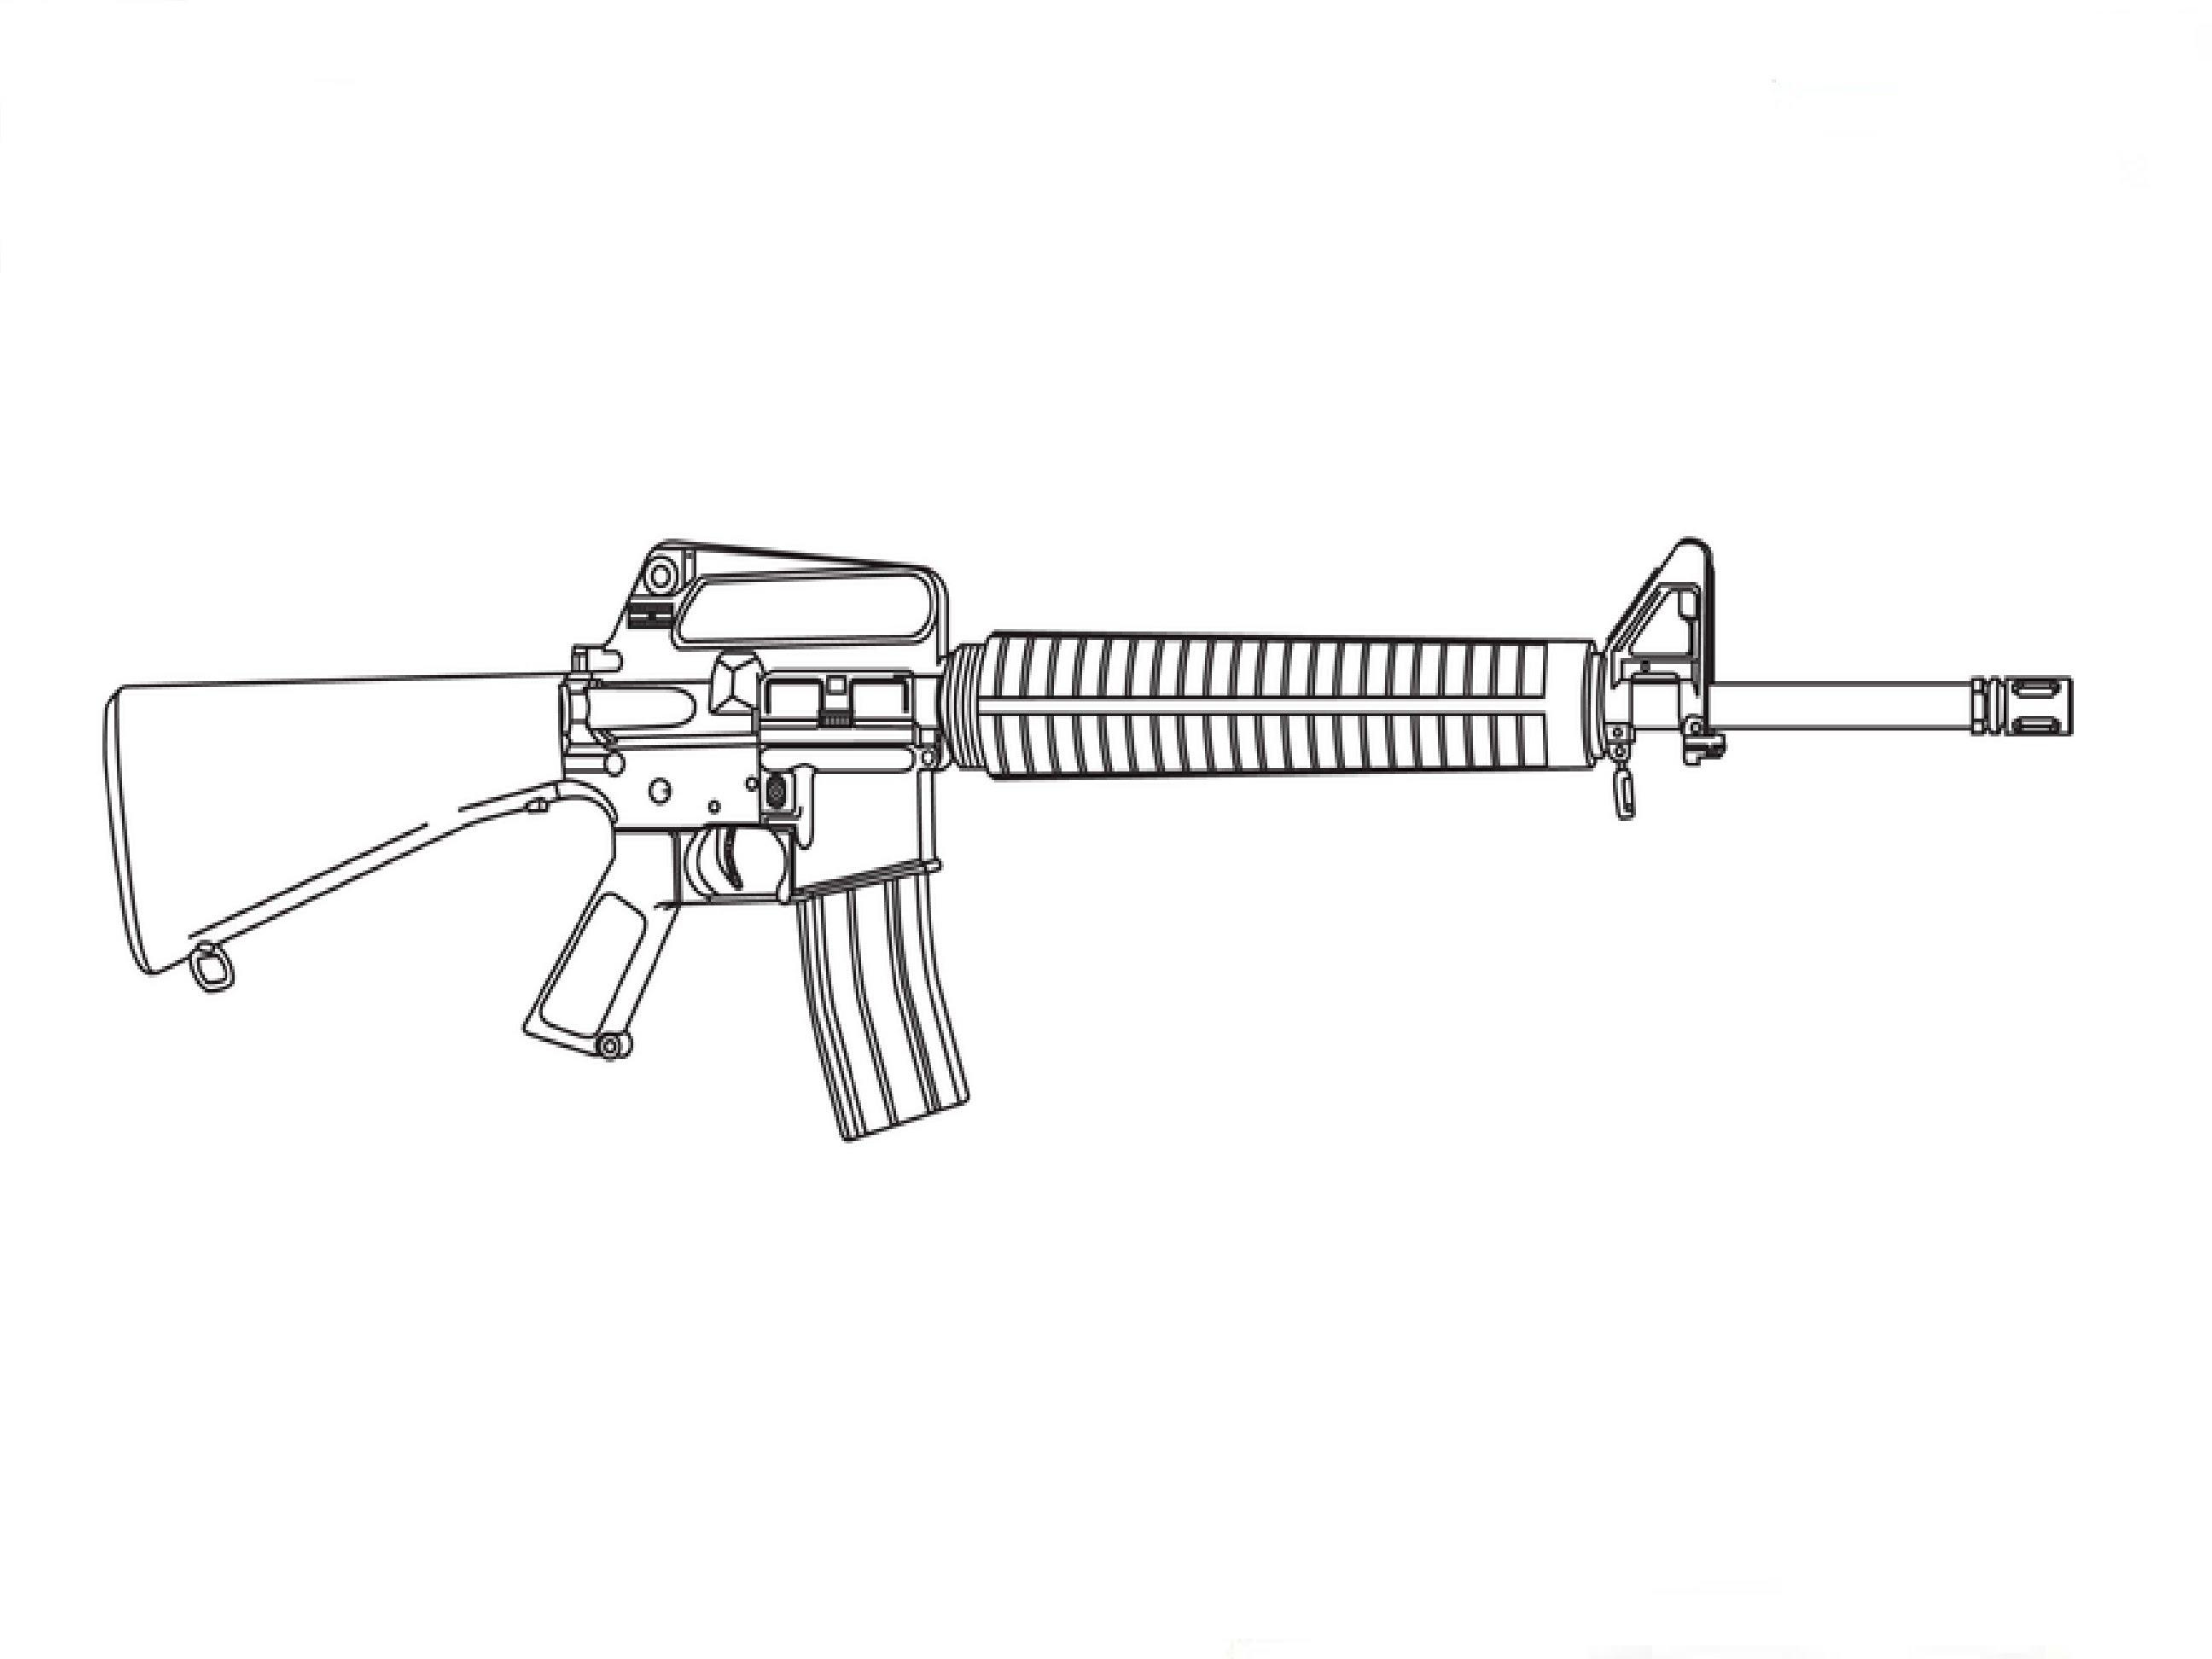 36 Immortal How To Draw Fortnite Guns.